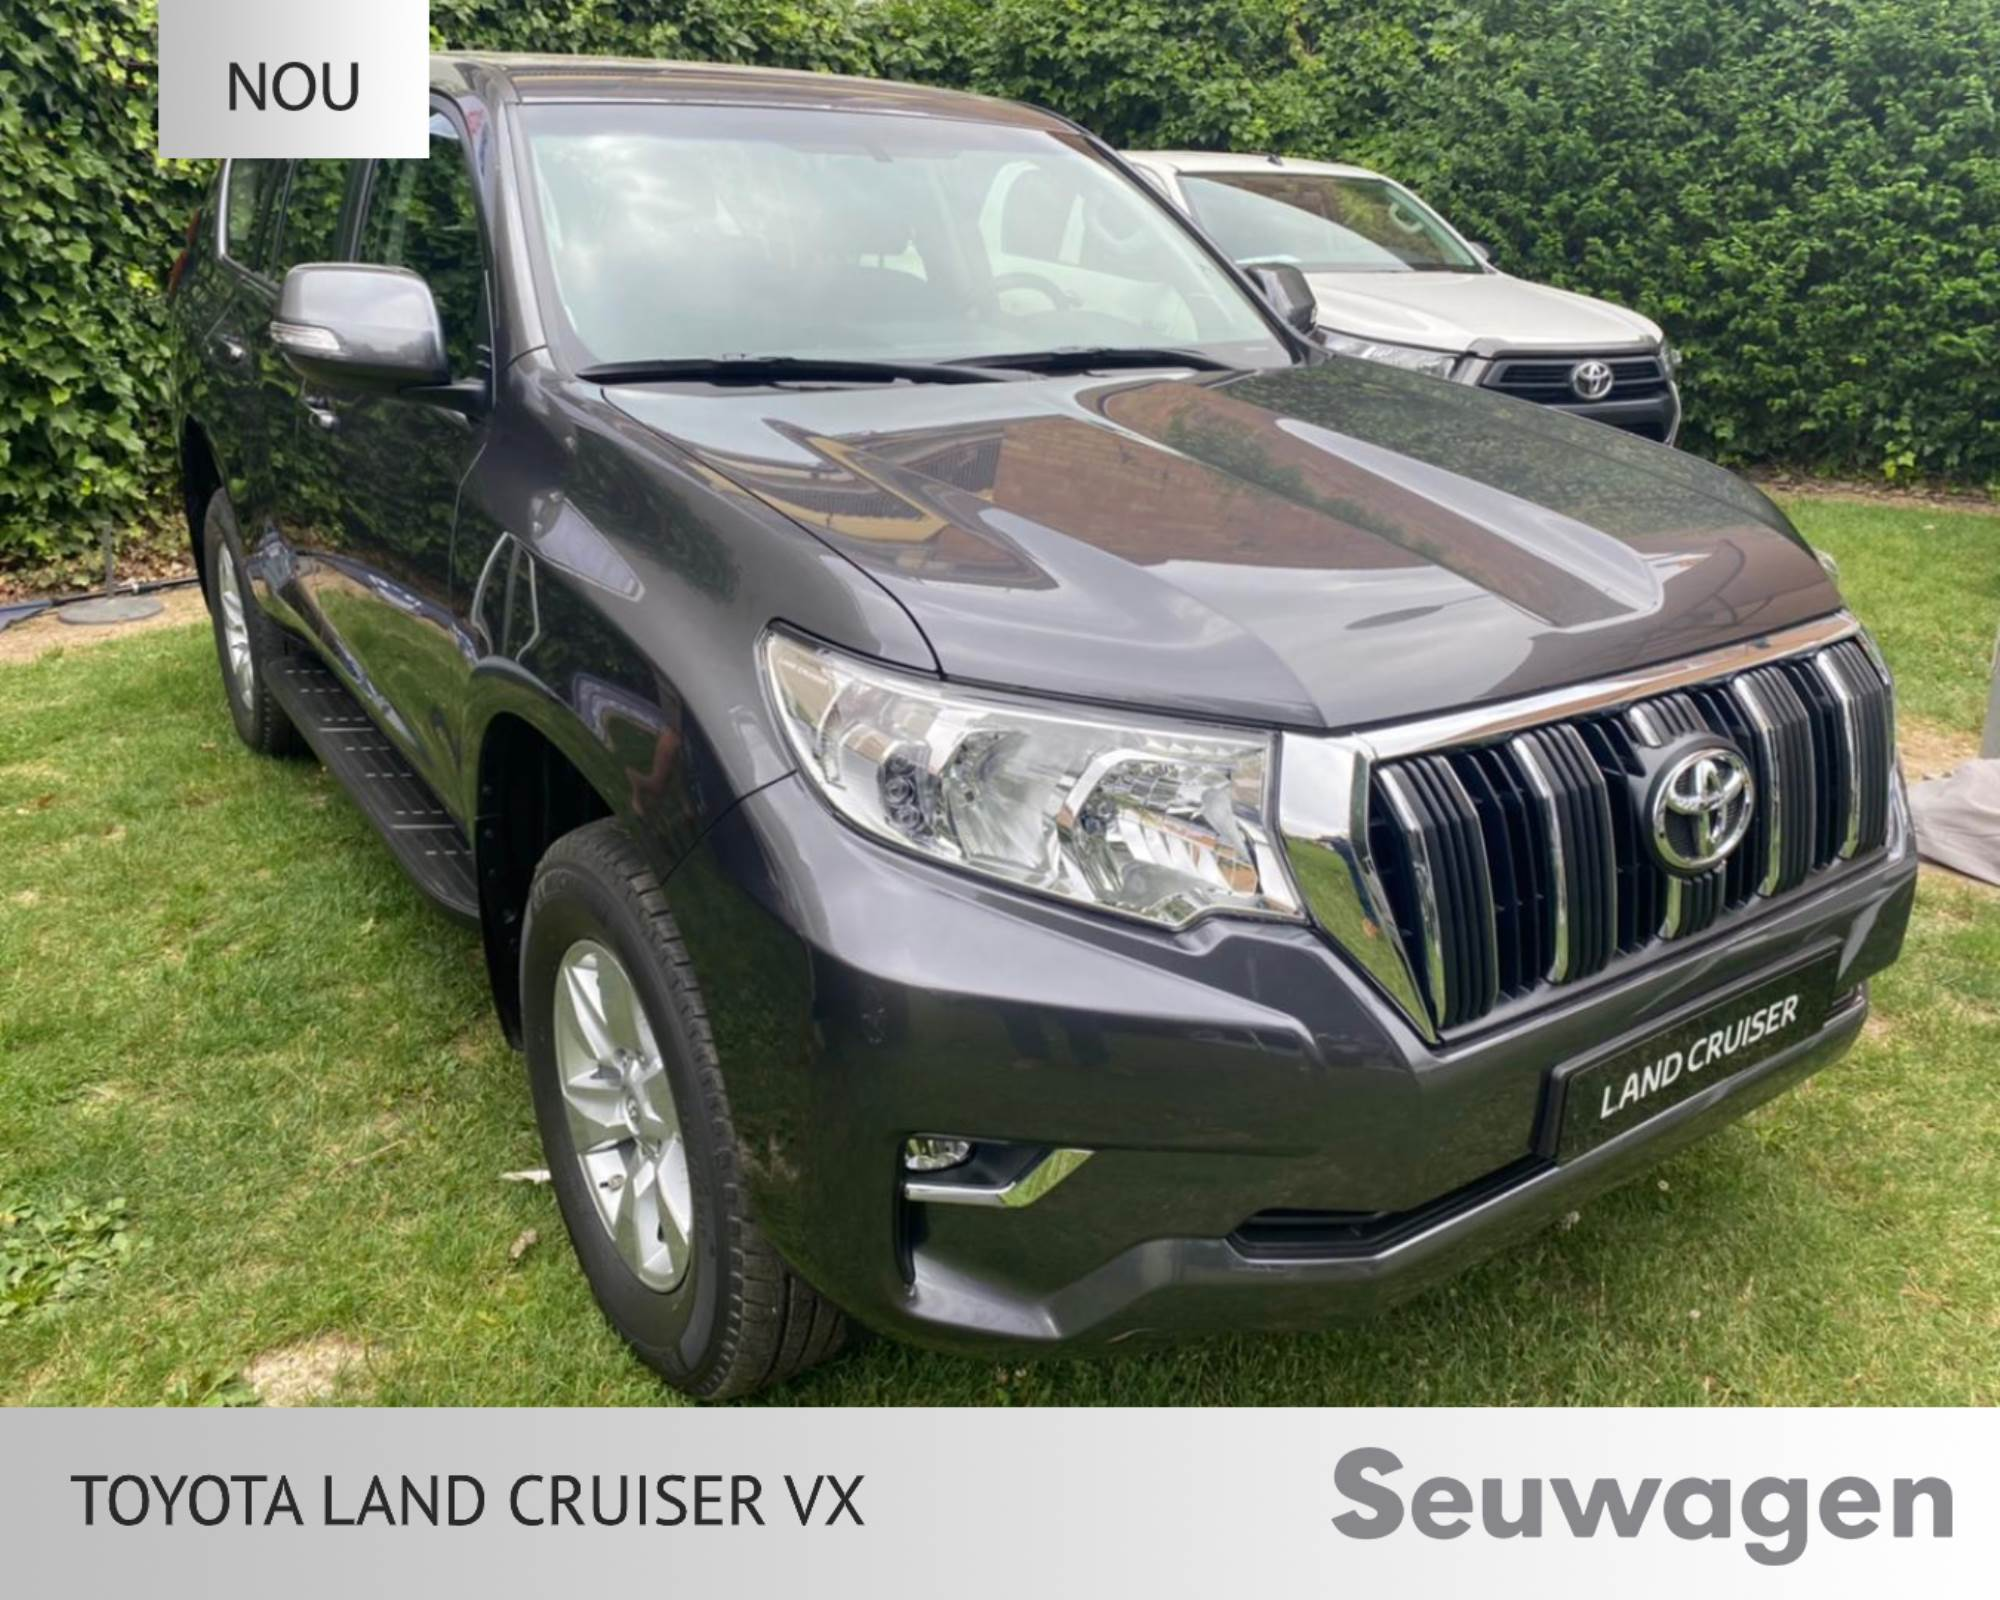 Toyota - Land Cruiser - VX Auto VX Auto Benzina  2021  00 Km